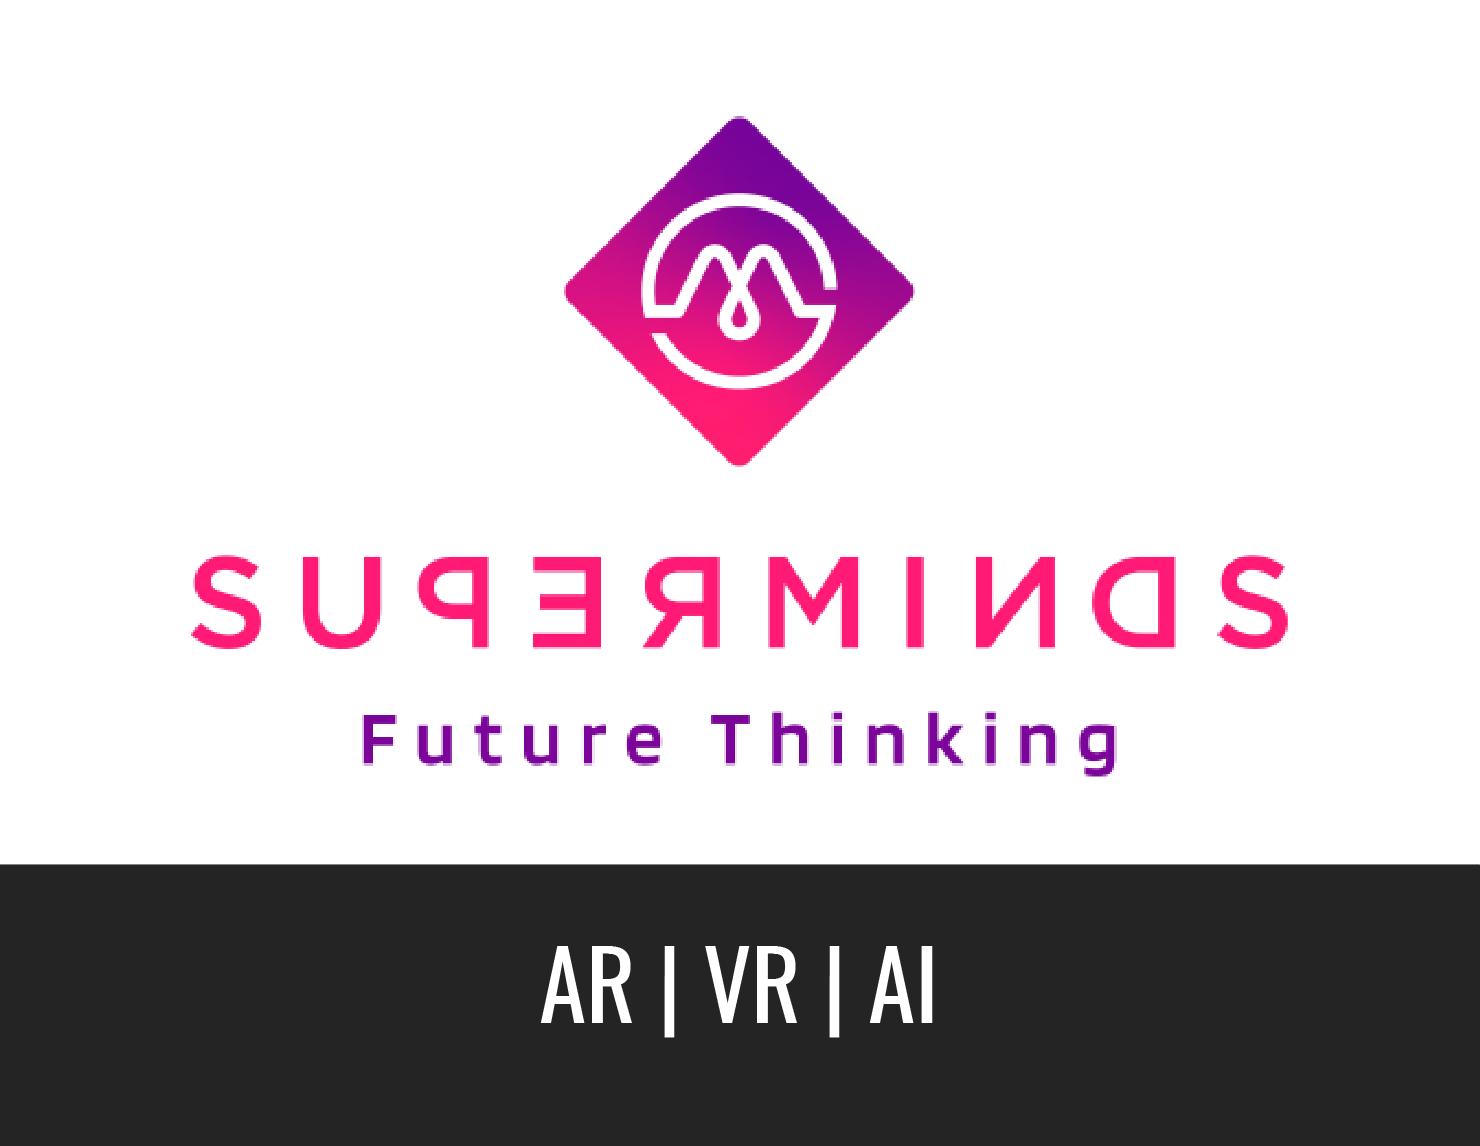 Future thinking homepage